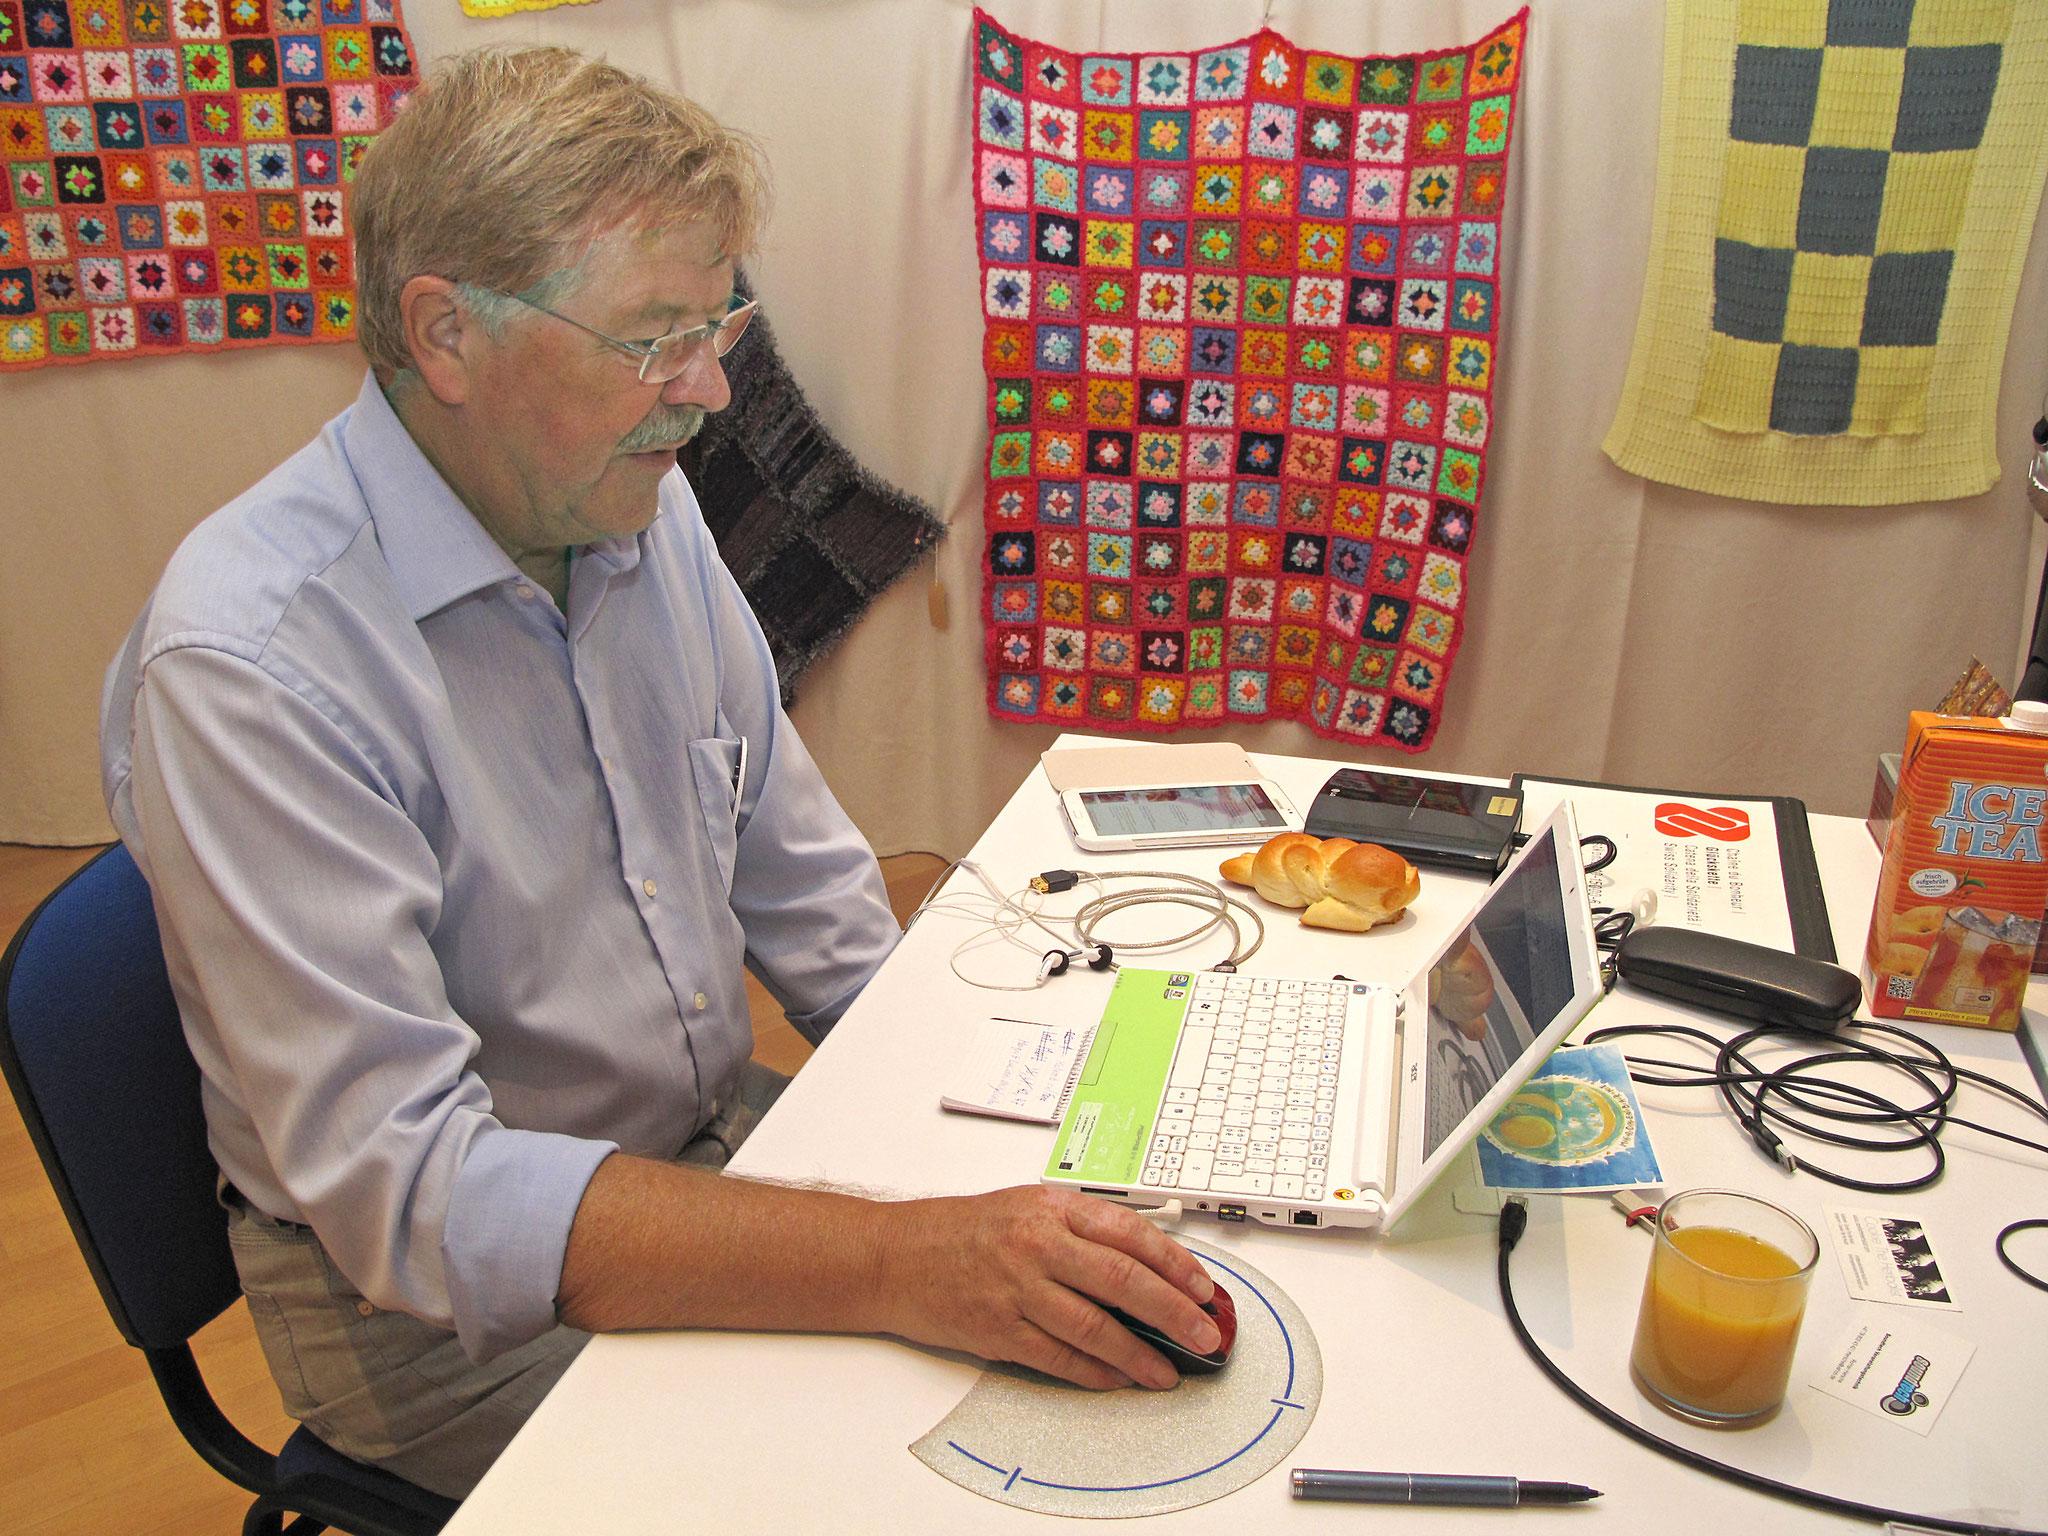 Roland Schmid, RadioChico Audiotechnik